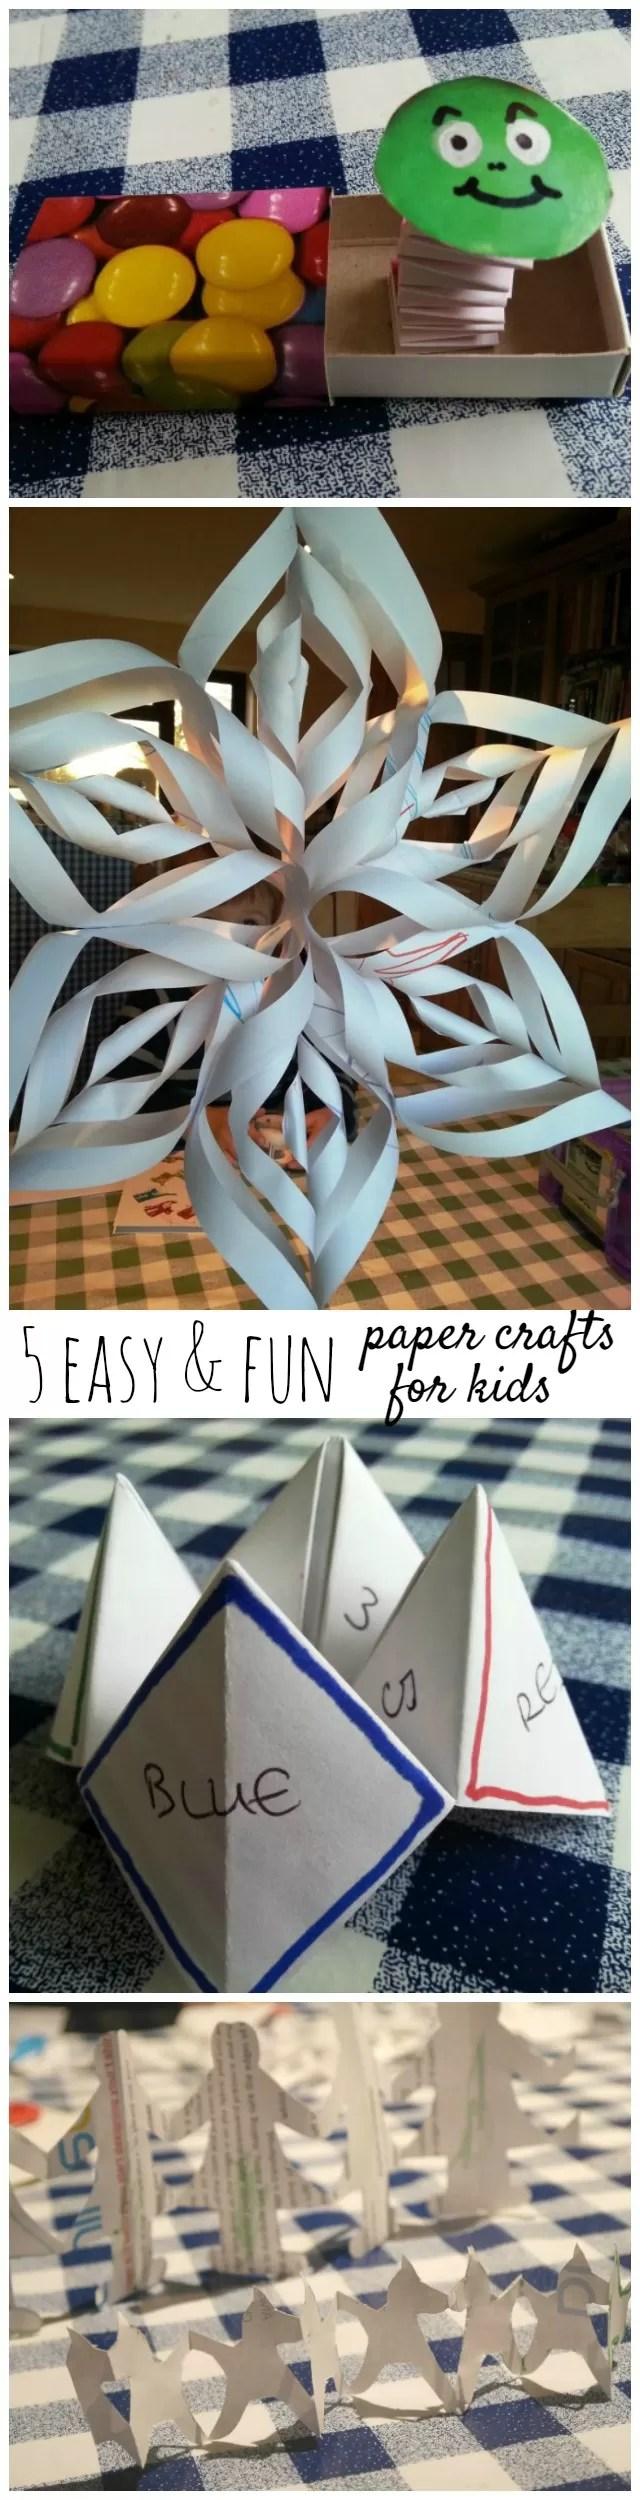 5 fun paper crafts for children